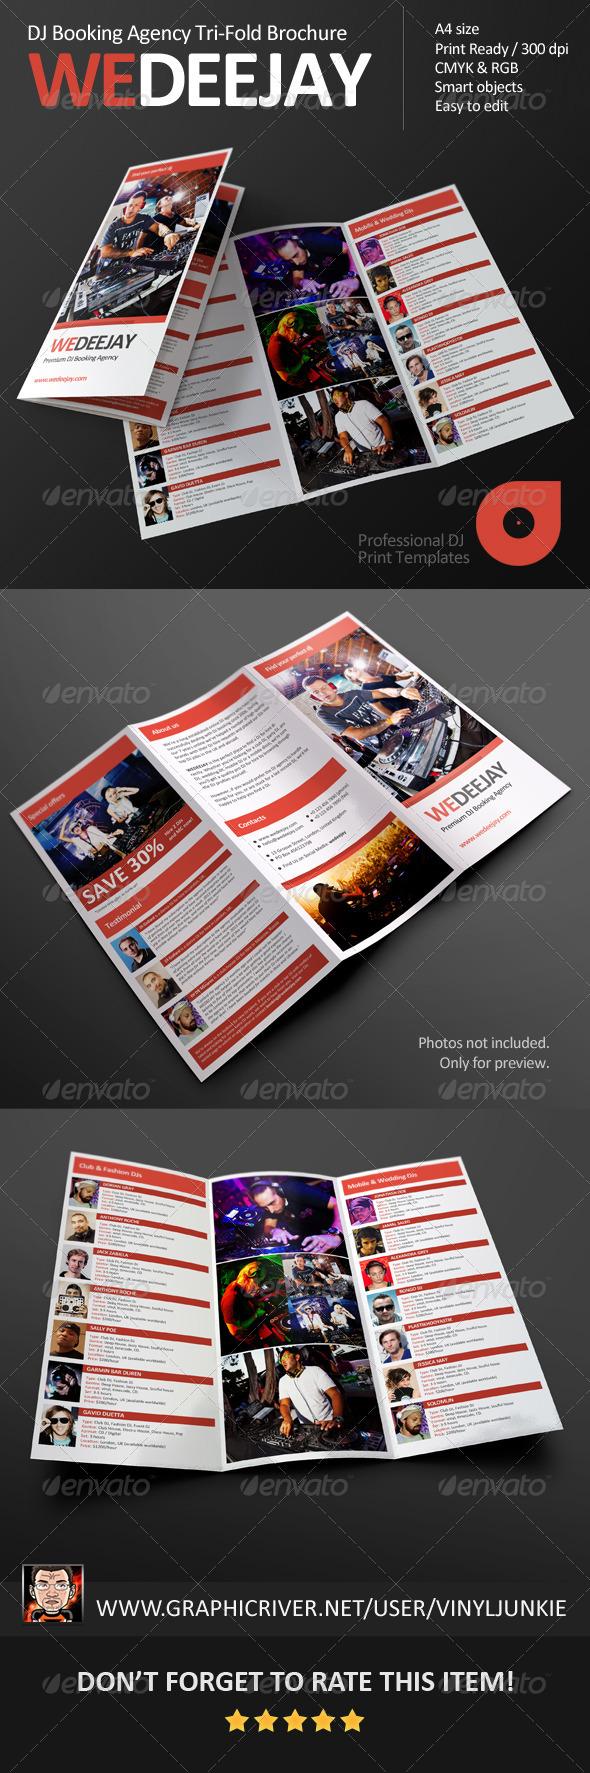 GraphicRiver WeDeeJay DJ Booking Agency Tri-Fold Brochure 5507163